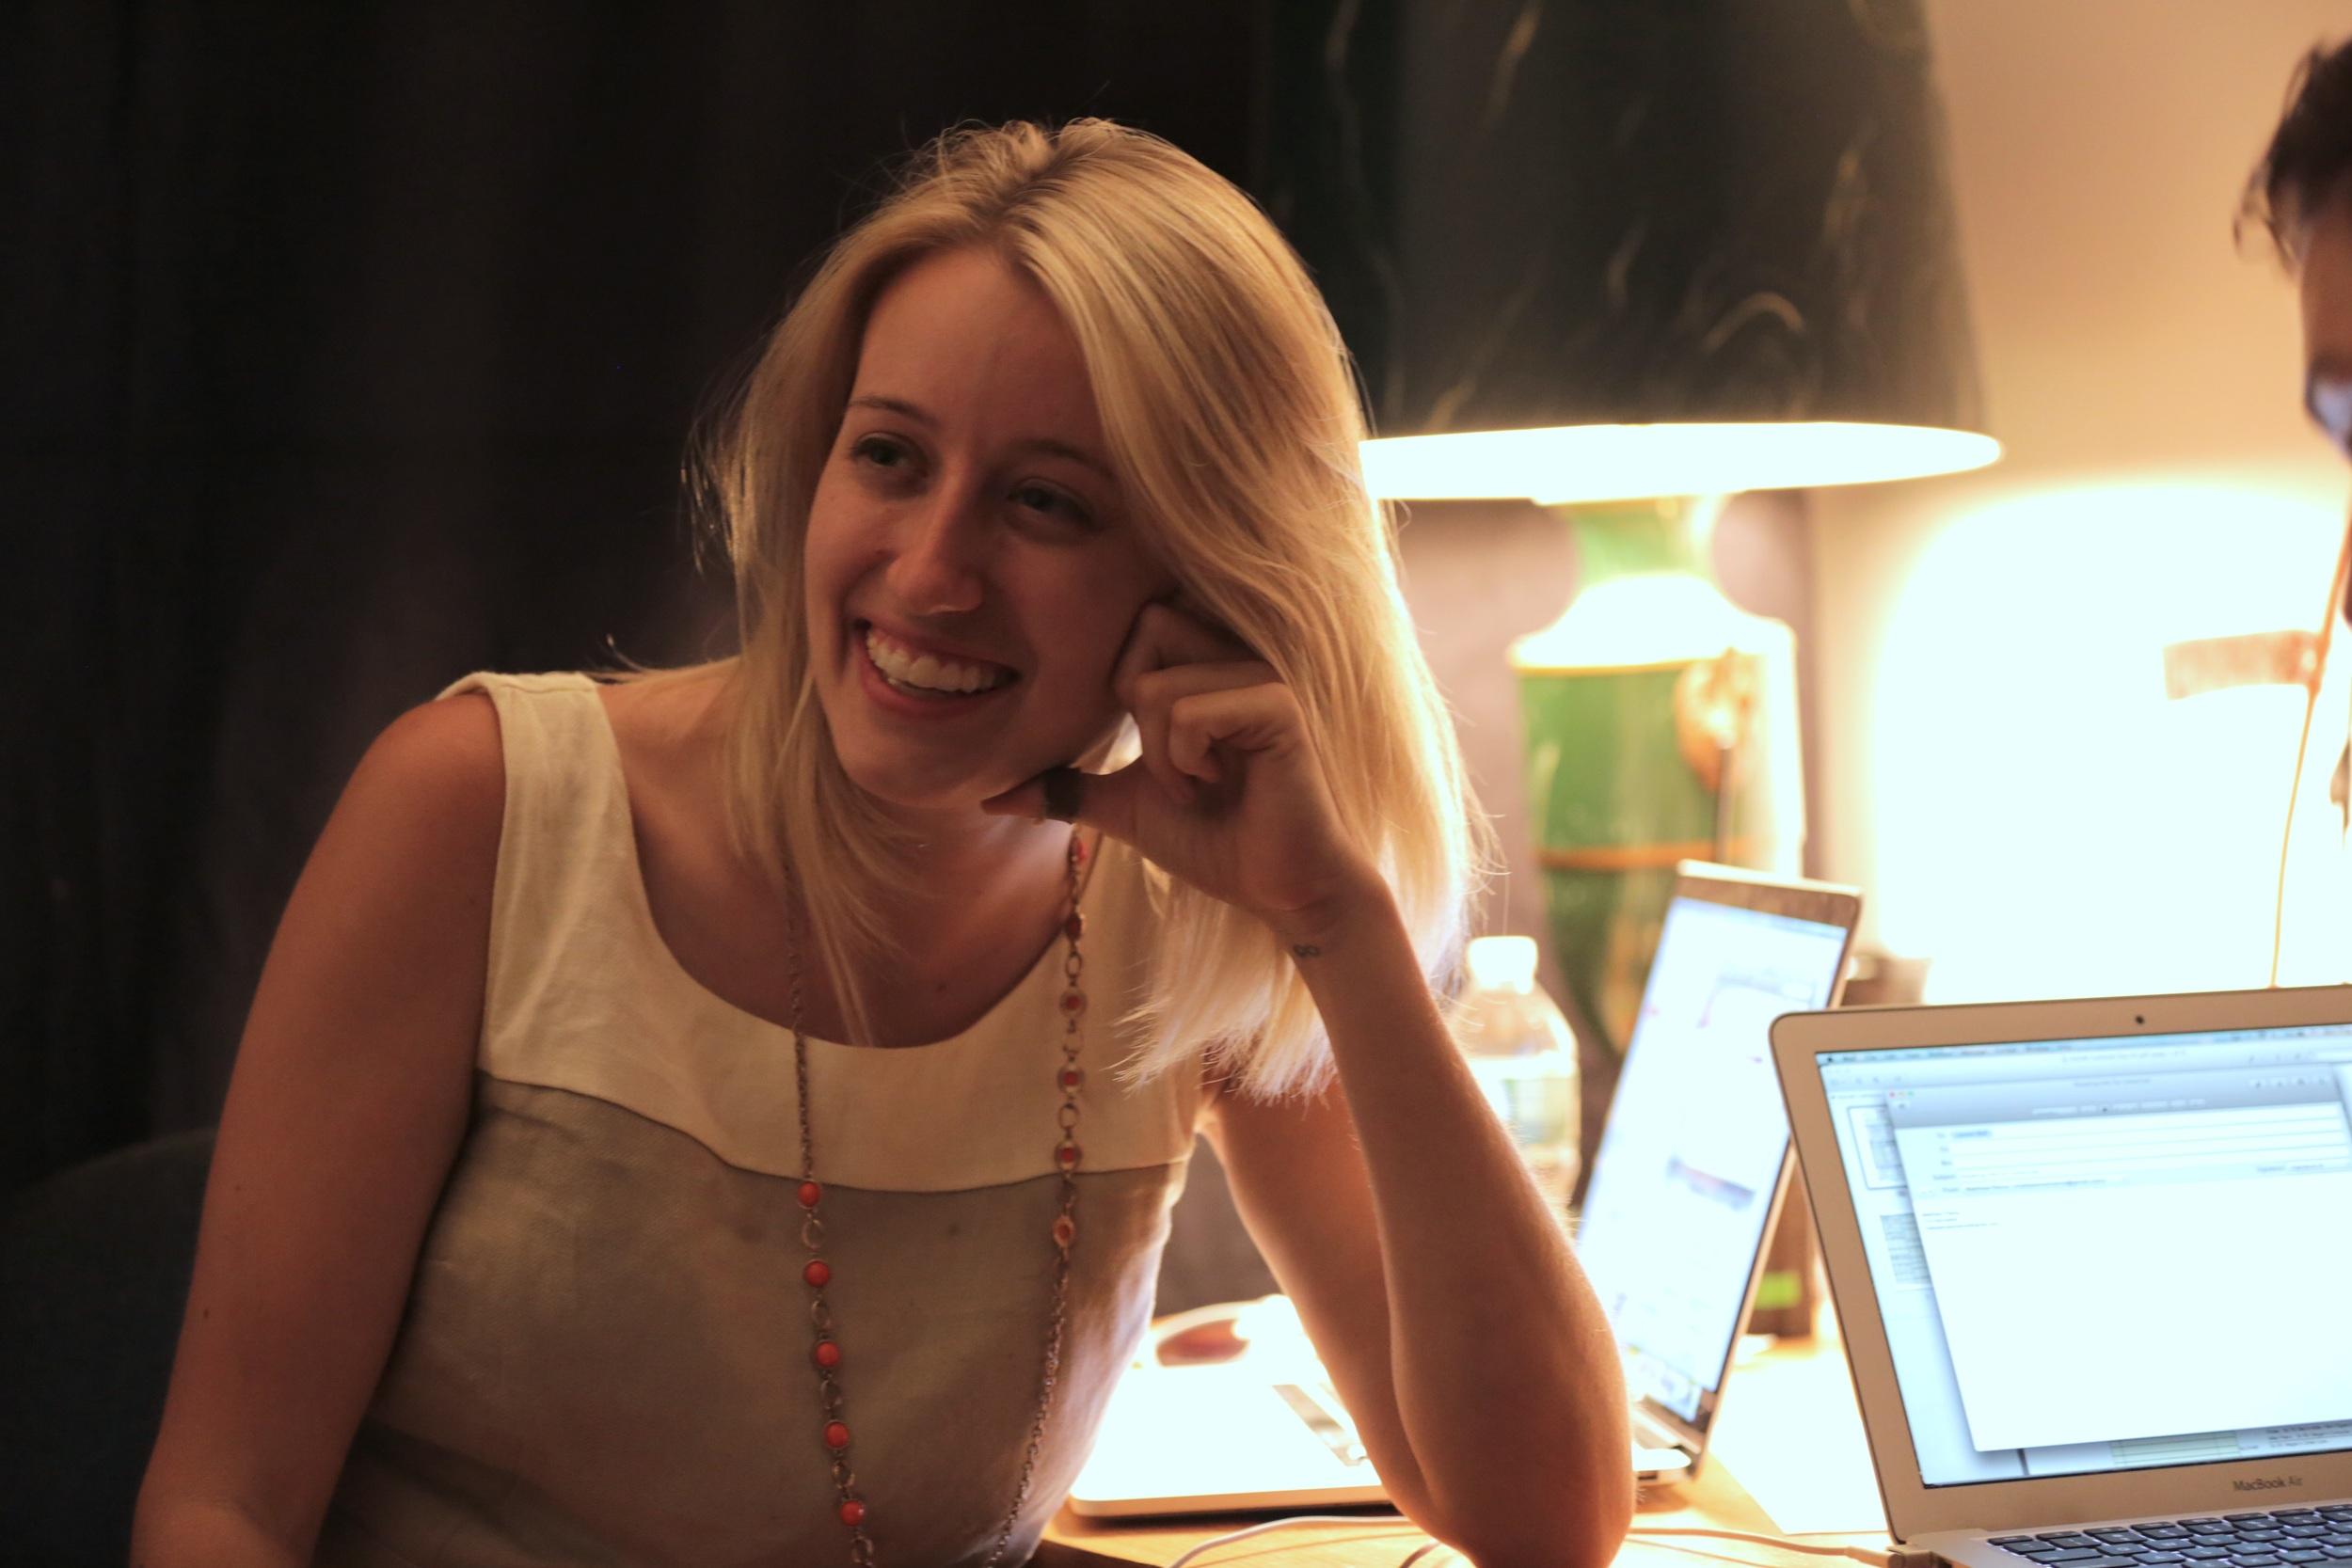 Lauren on set producing    SUGAR!    starring Tony Award Winner Alice Ripley (2014)